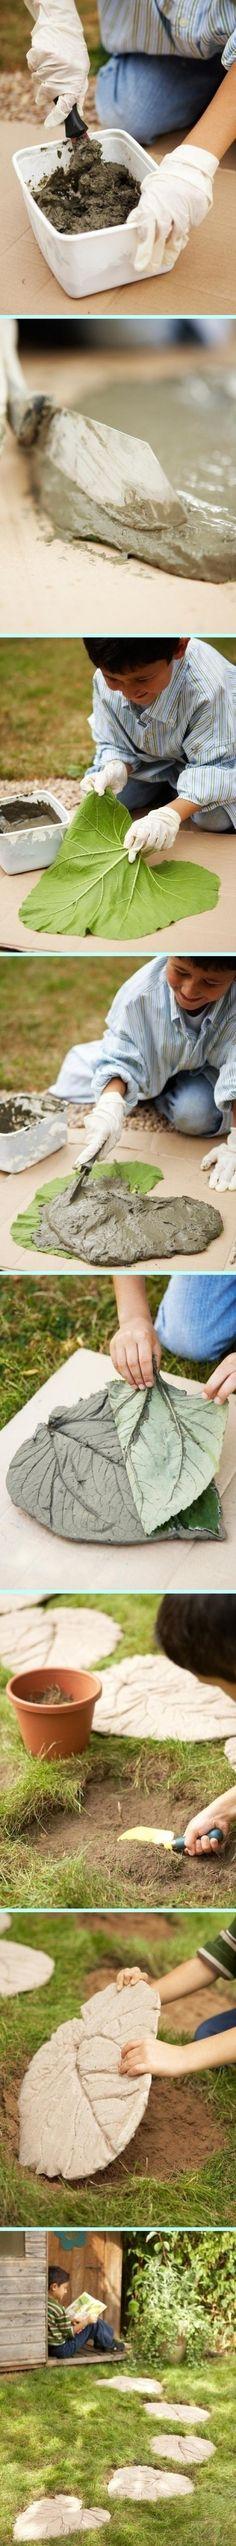 concrete leaves, garden stepping stones, step stone, yard, stone paths, garden paths, elephant ears, leaf step, kid